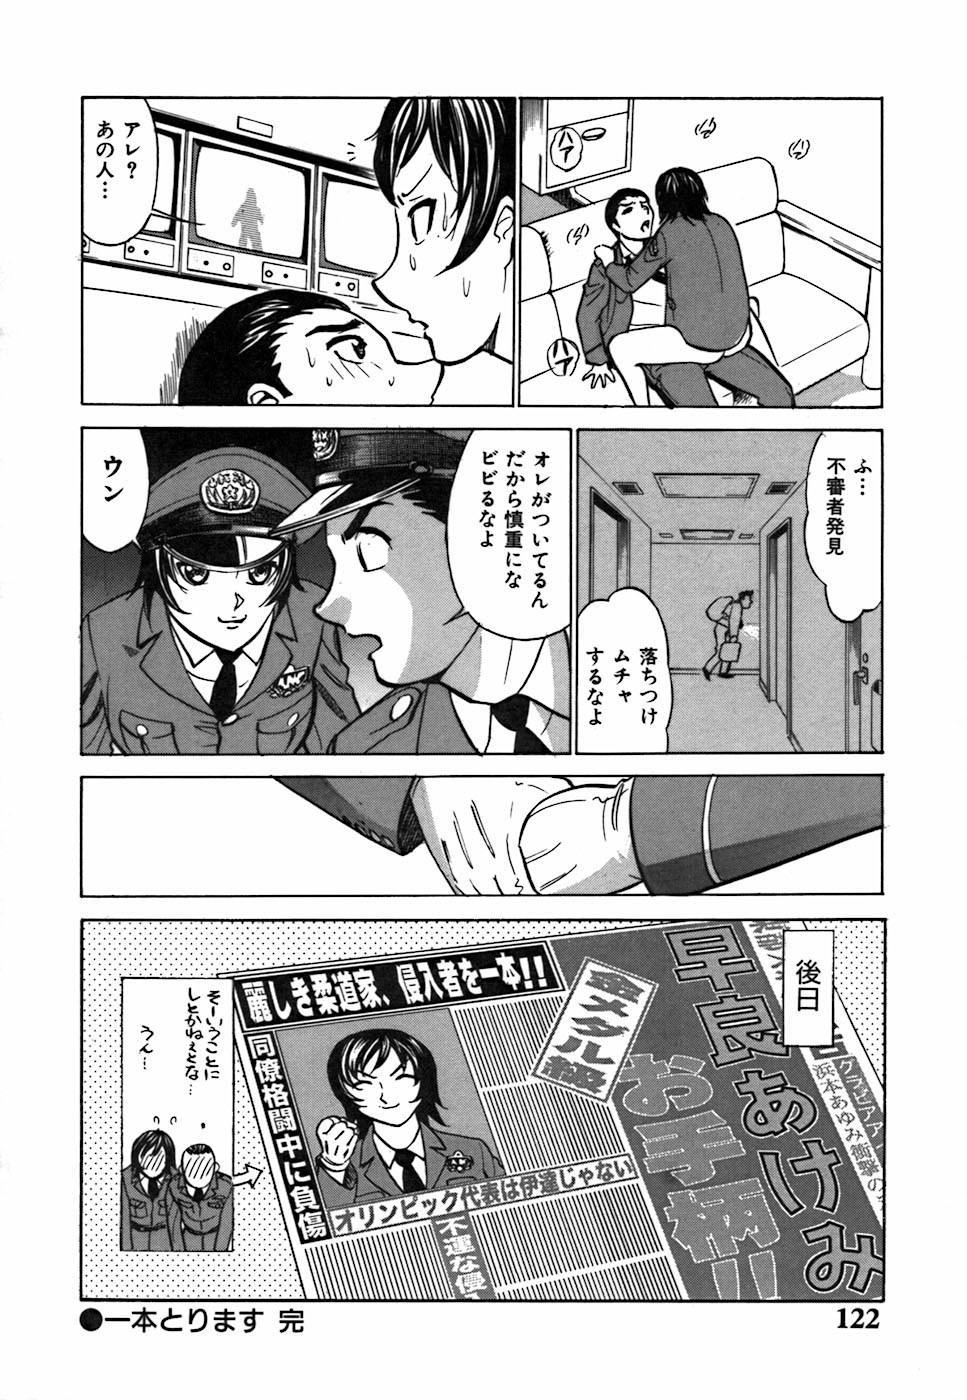 Kimi ga Nozomu Katachi | Appearance for which you hope 121